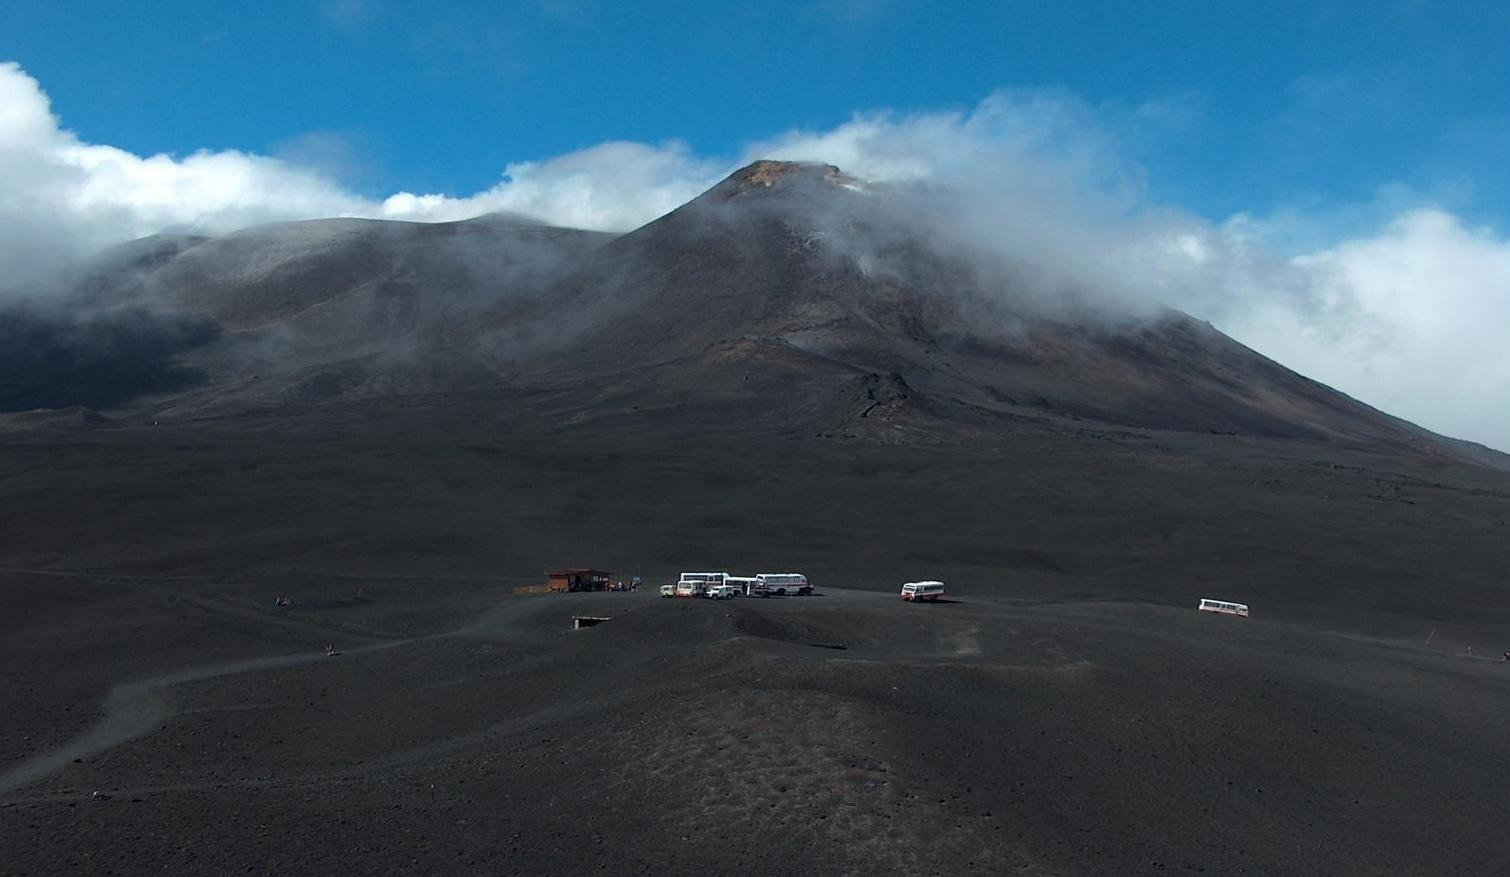 etna-summit-craters-1584475579.jpg